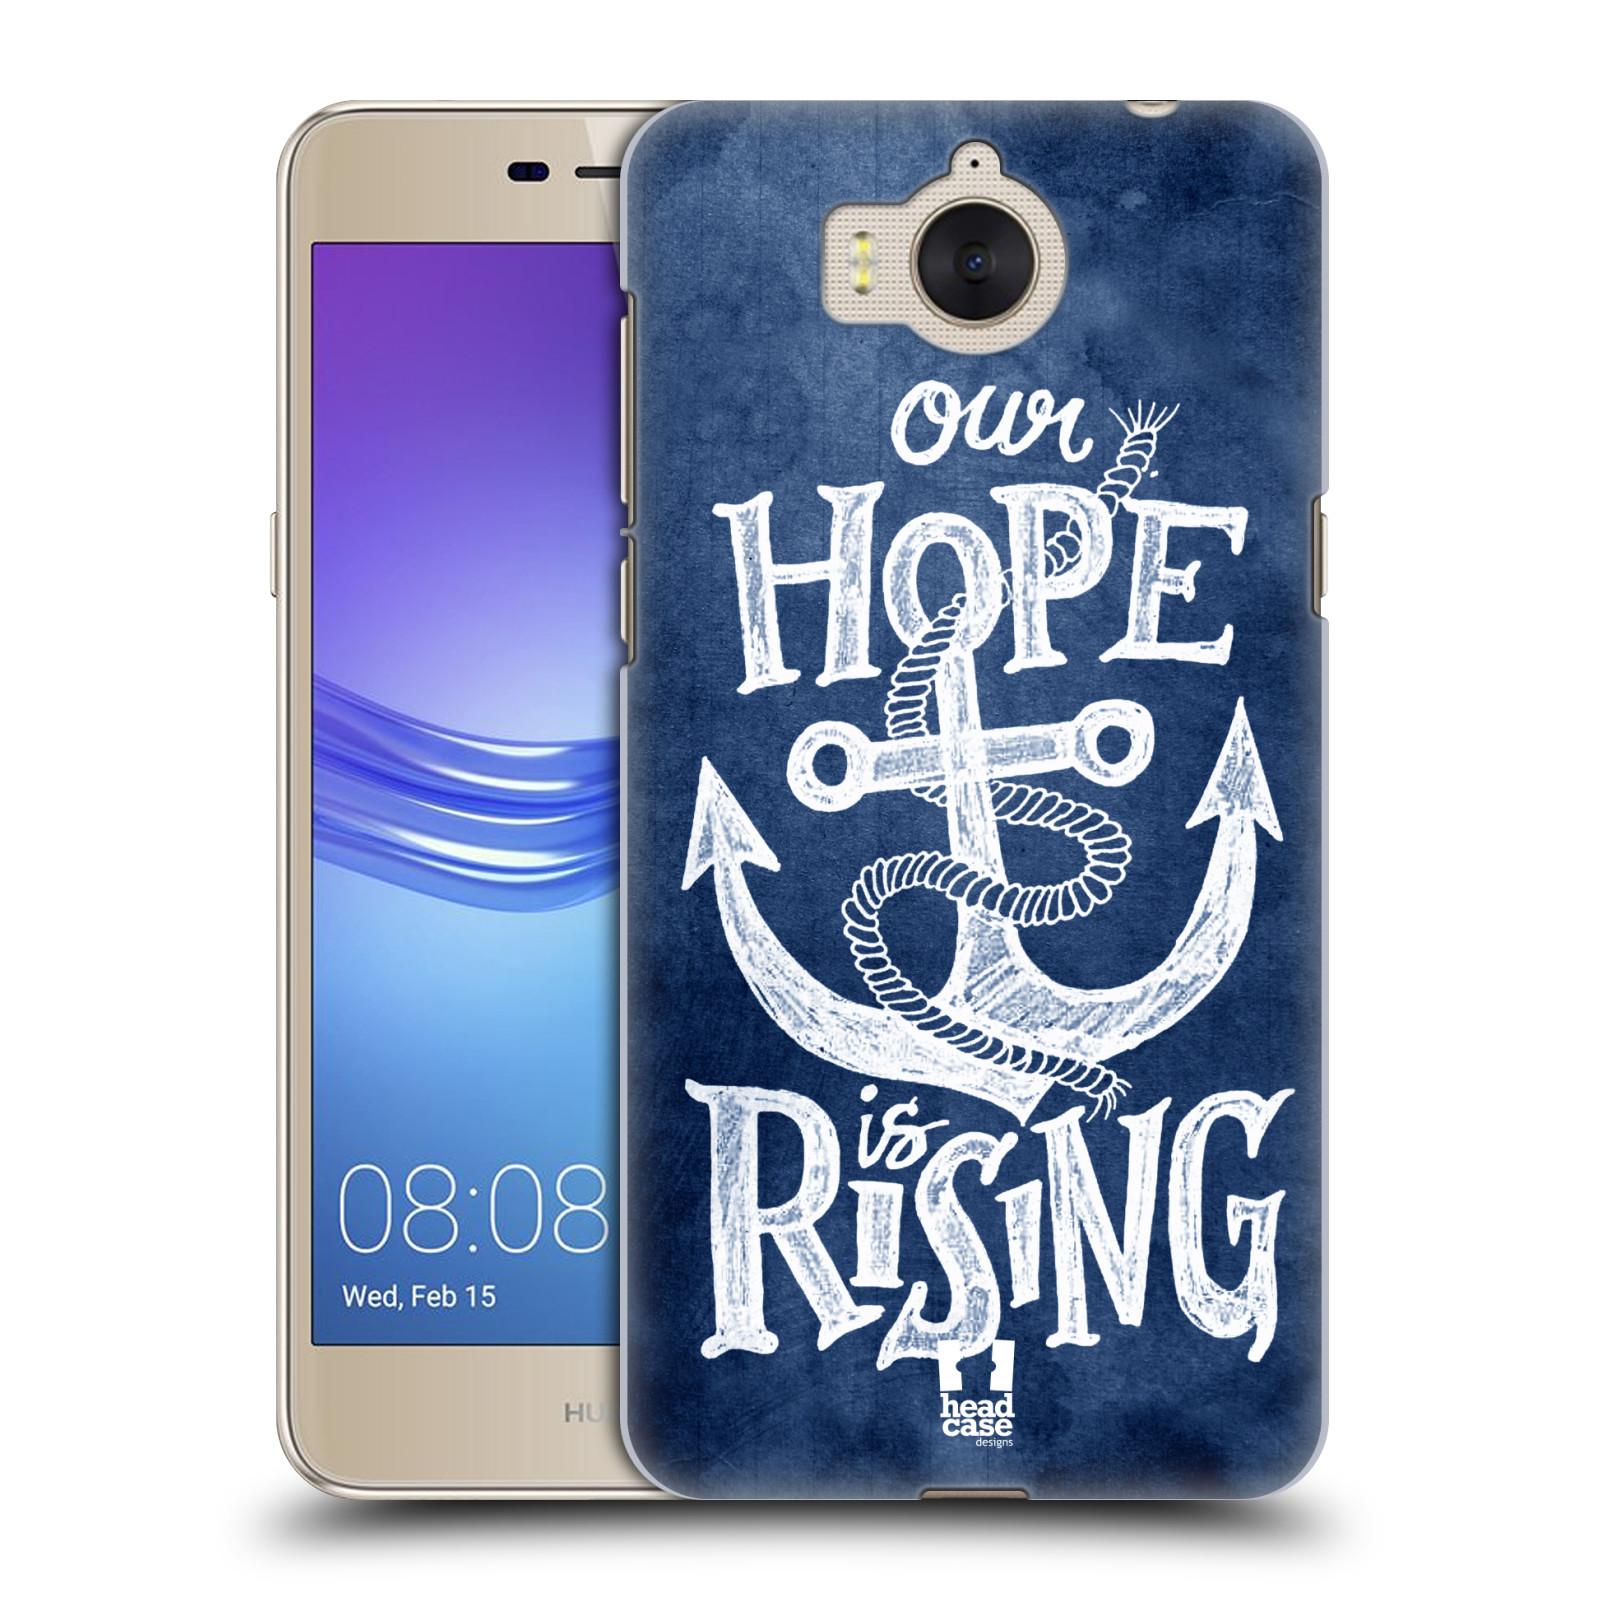 Plastové pouzdro na mobil Huawei Y6 2017 - Head Case - KOTVA RISING